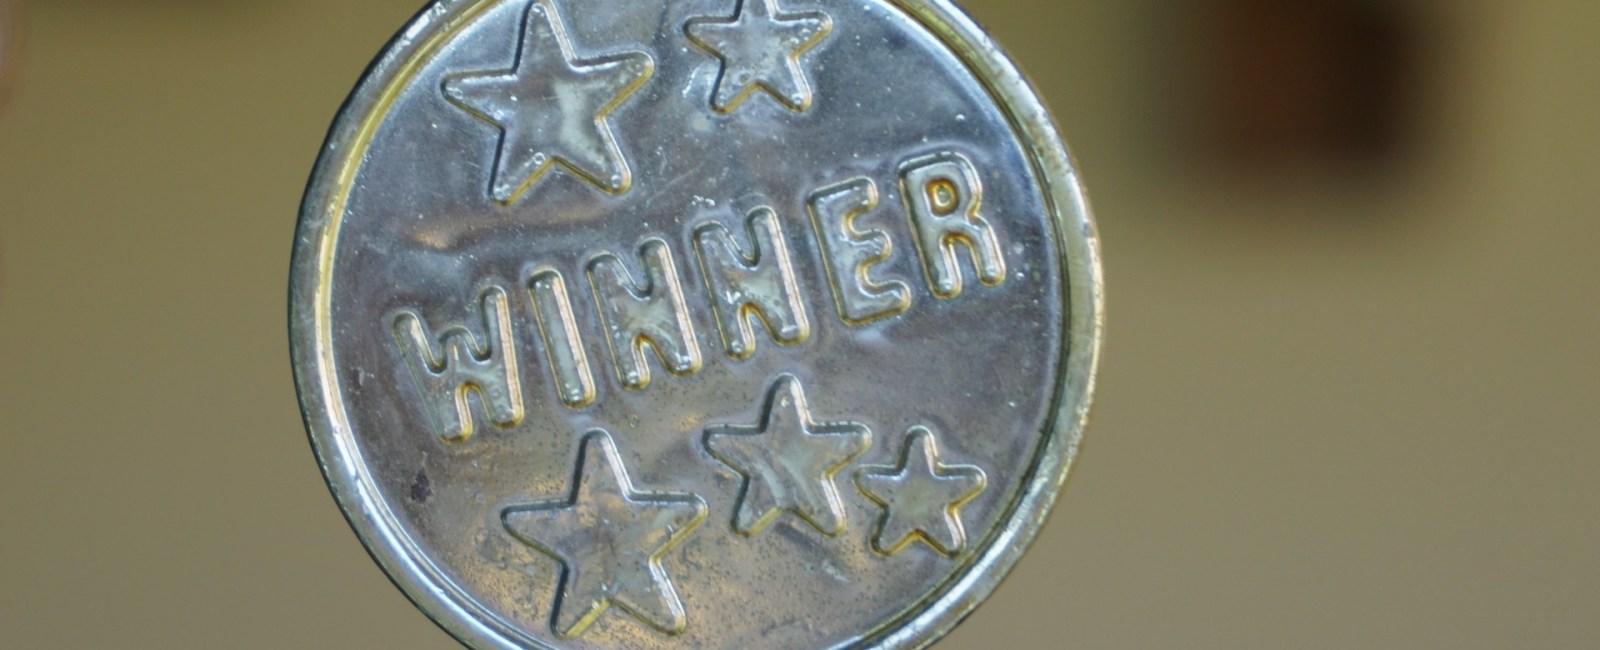 Winner award medal (Photo credit:AxxLC / Pixabay)